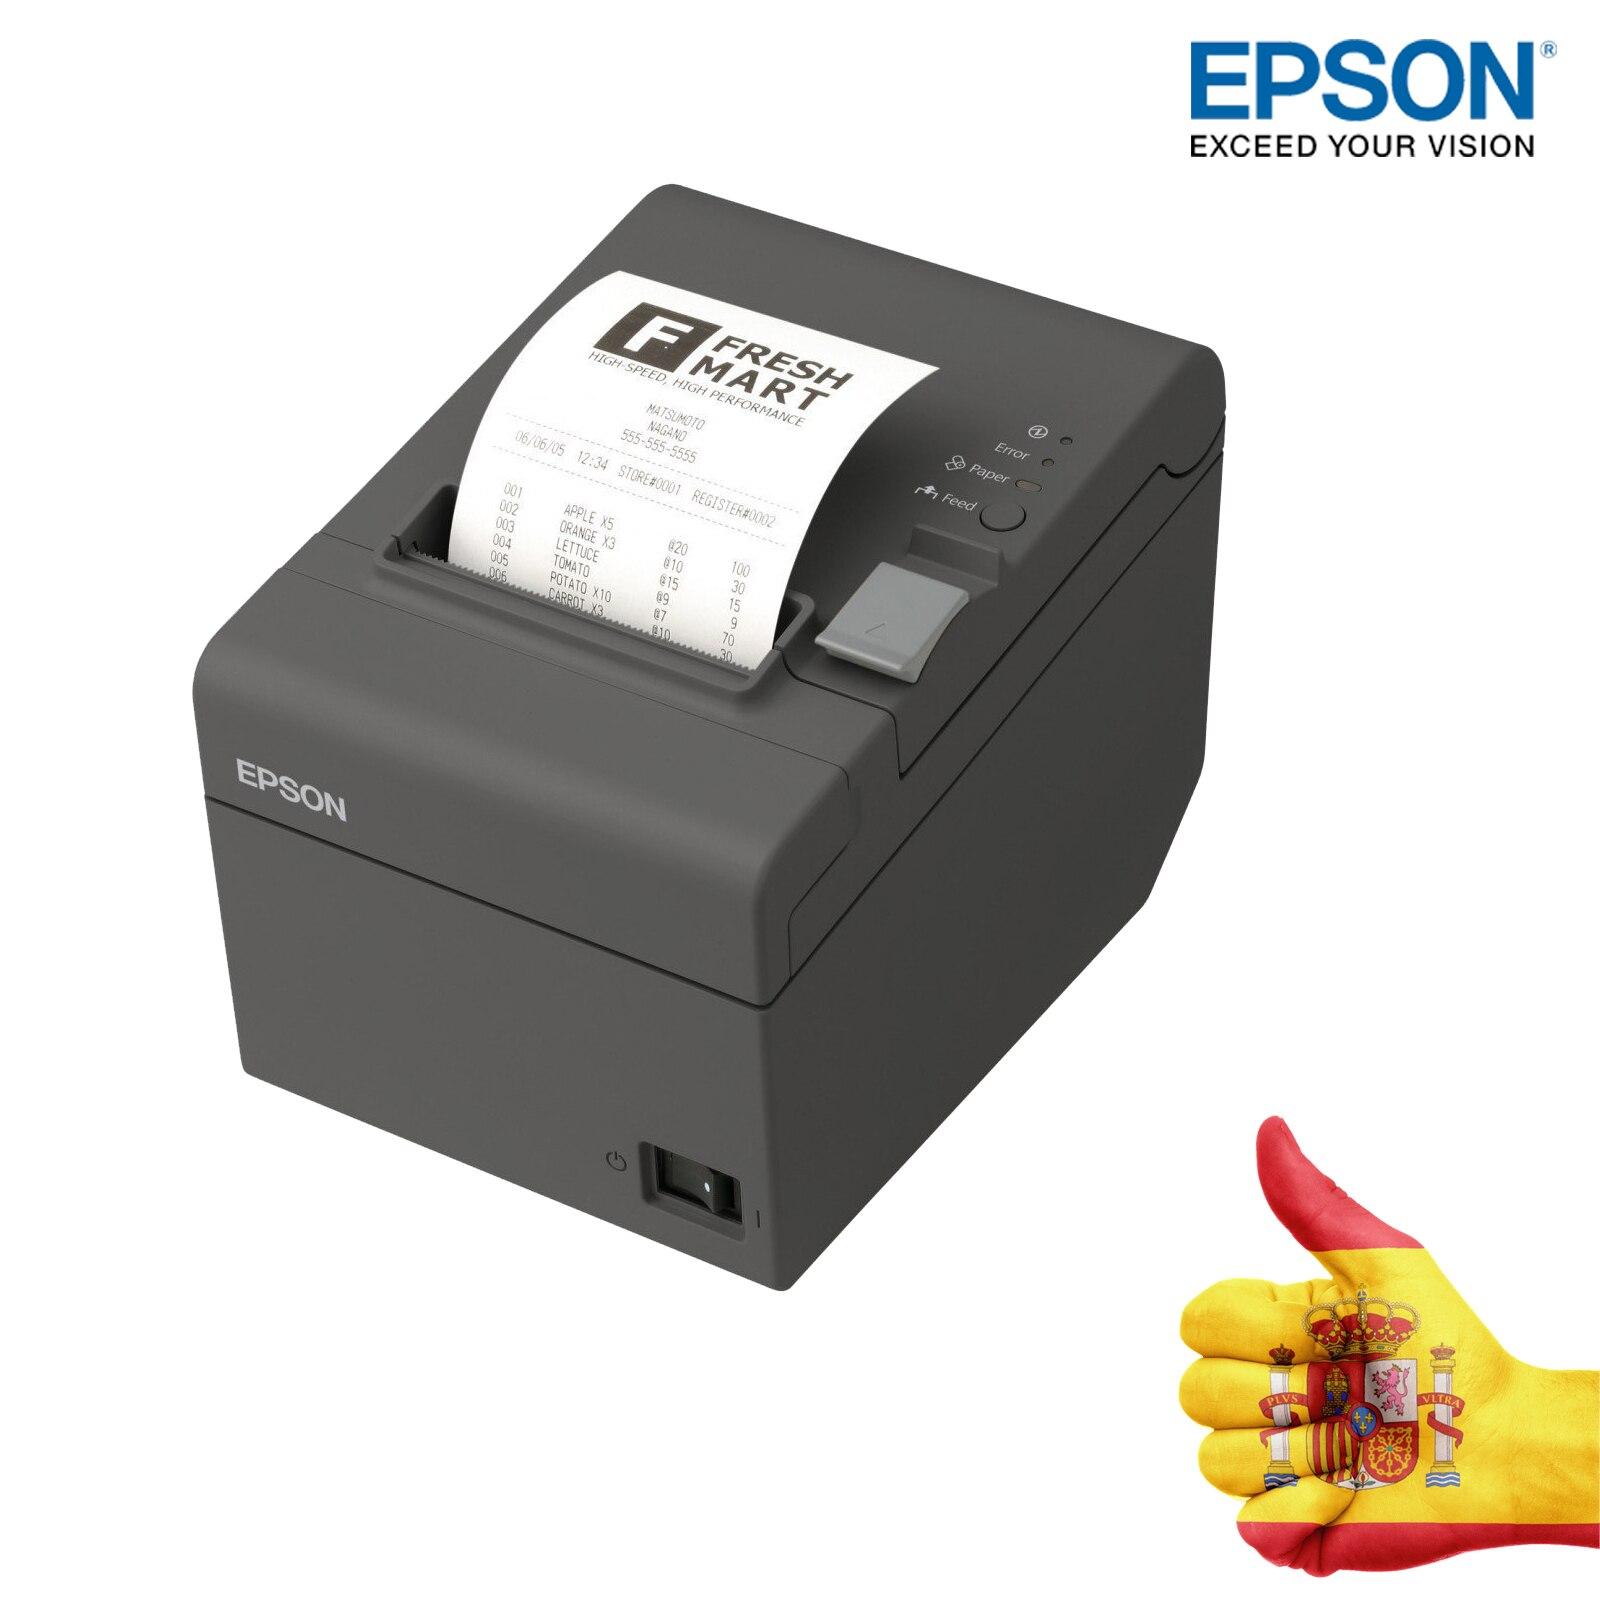 TPV PRINTER TICKET PRINTER EPSON TMT20II NEG USB RS232